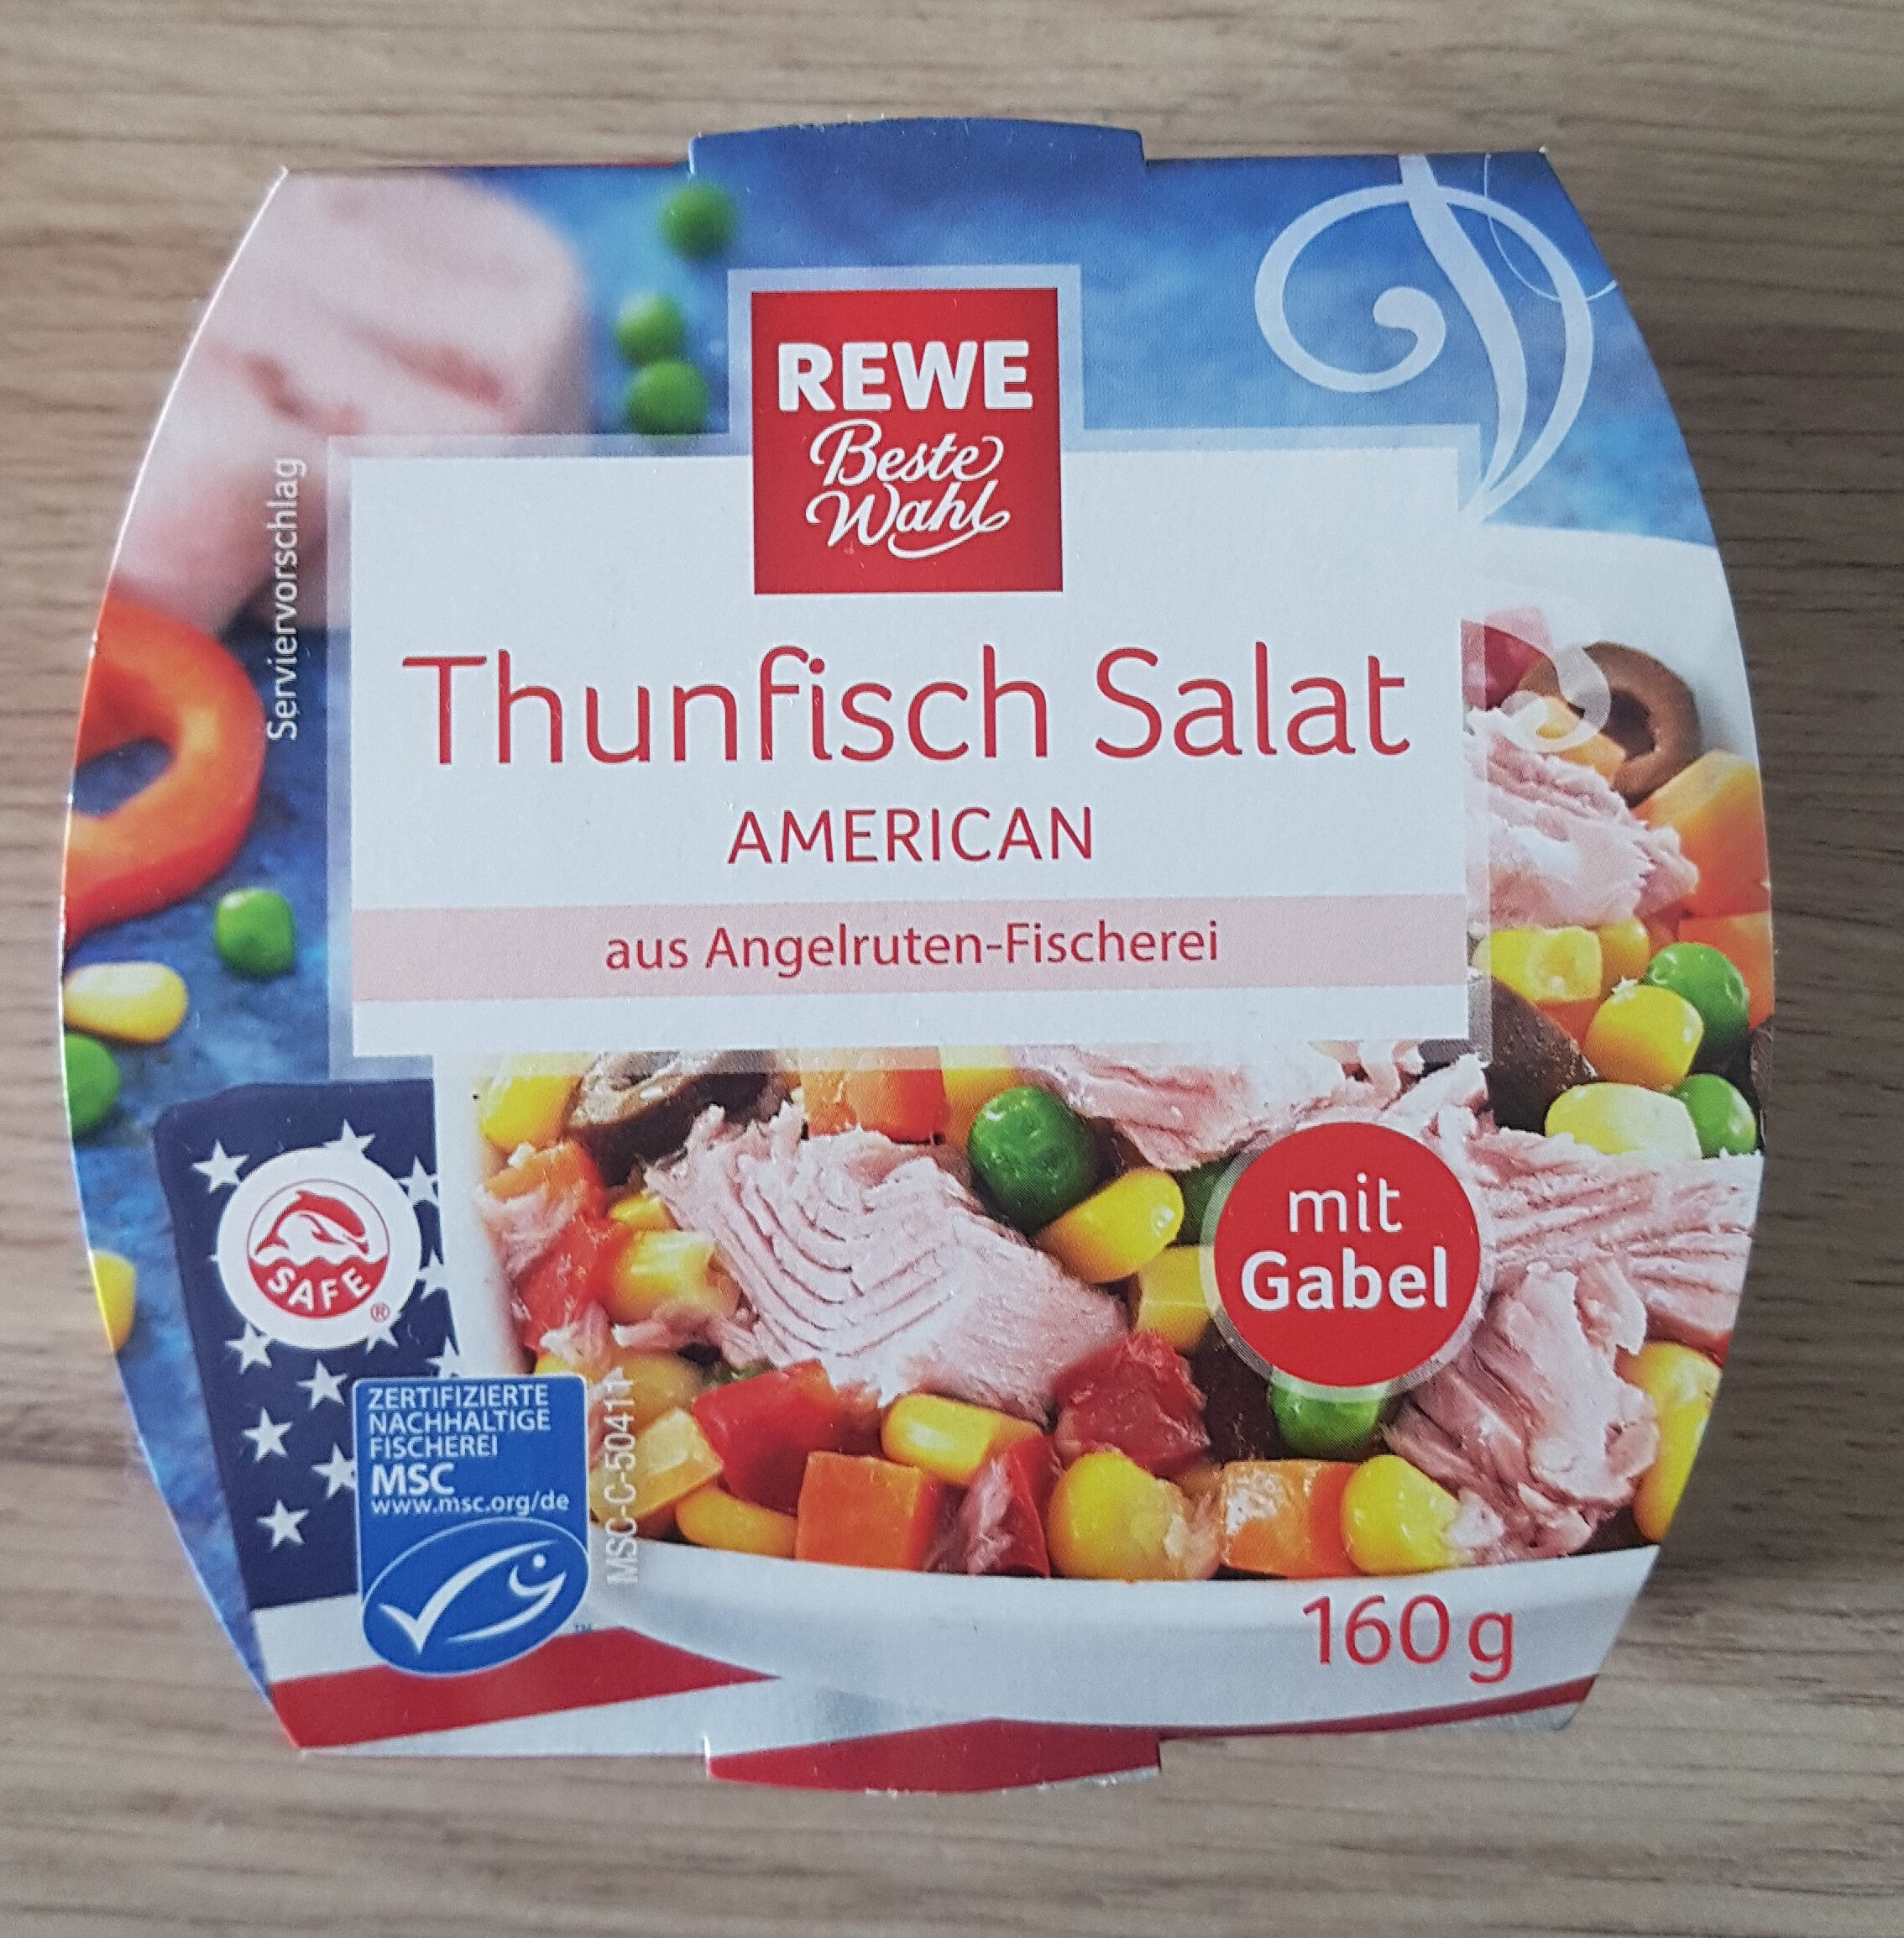 Thunfisch Salat American - Prodotto - de